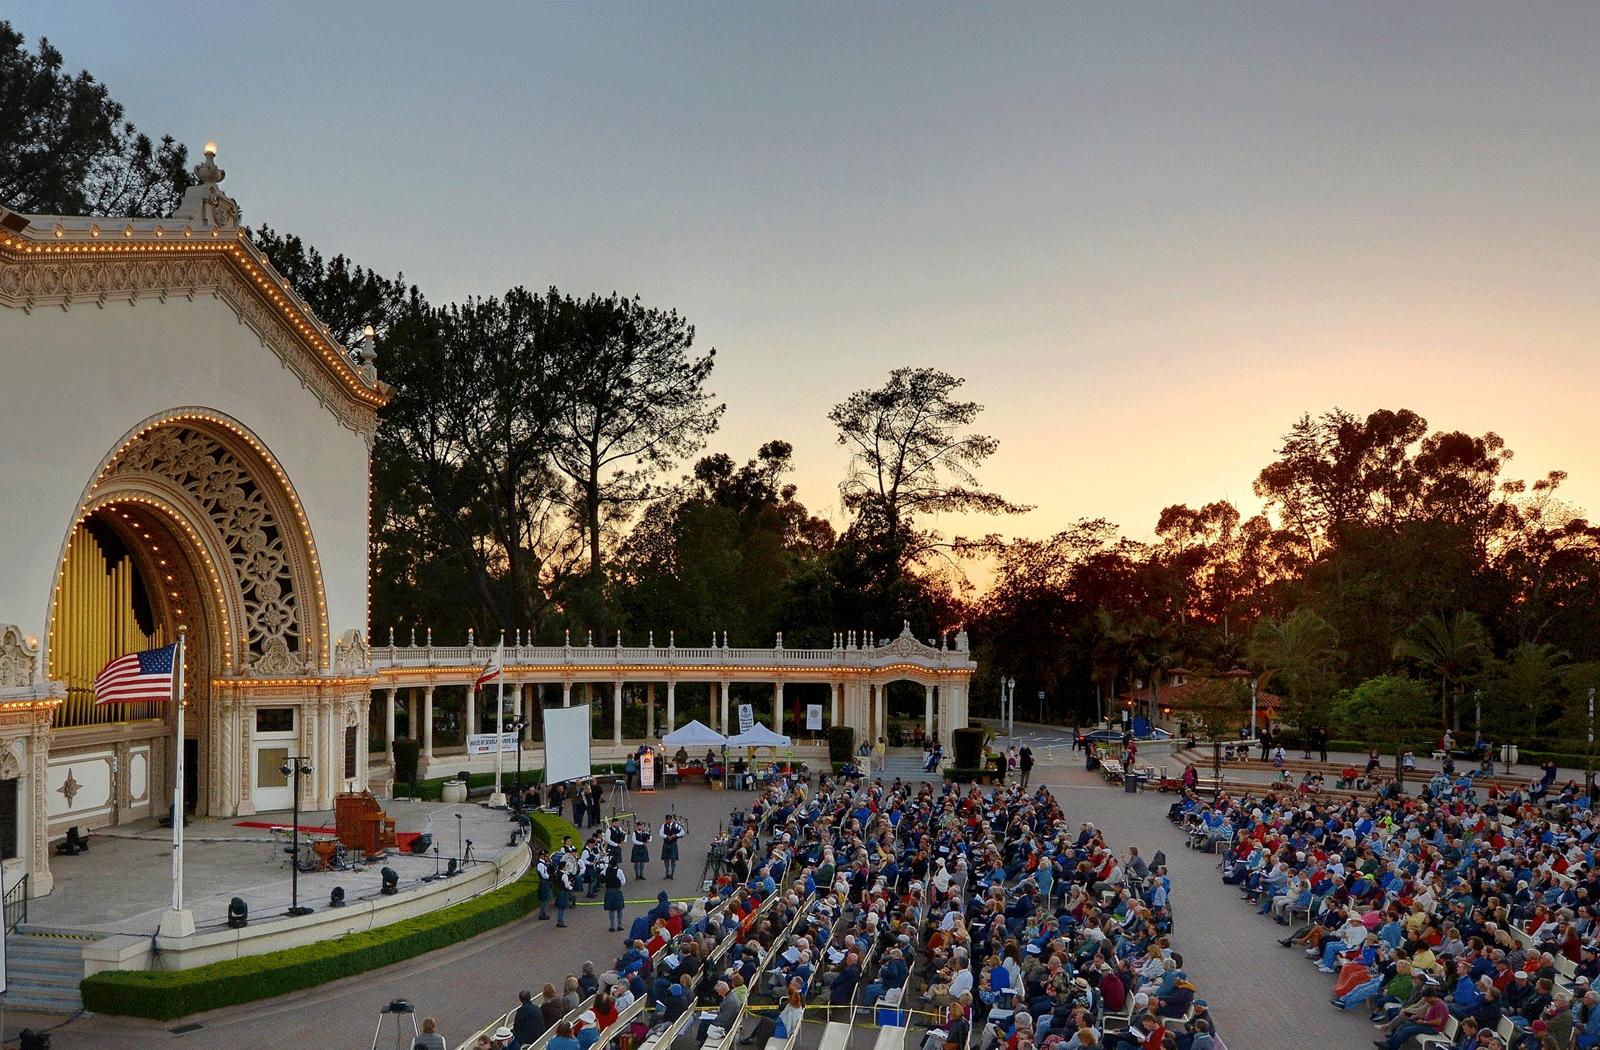 Balboa Park Spreckels Organ Pavilion